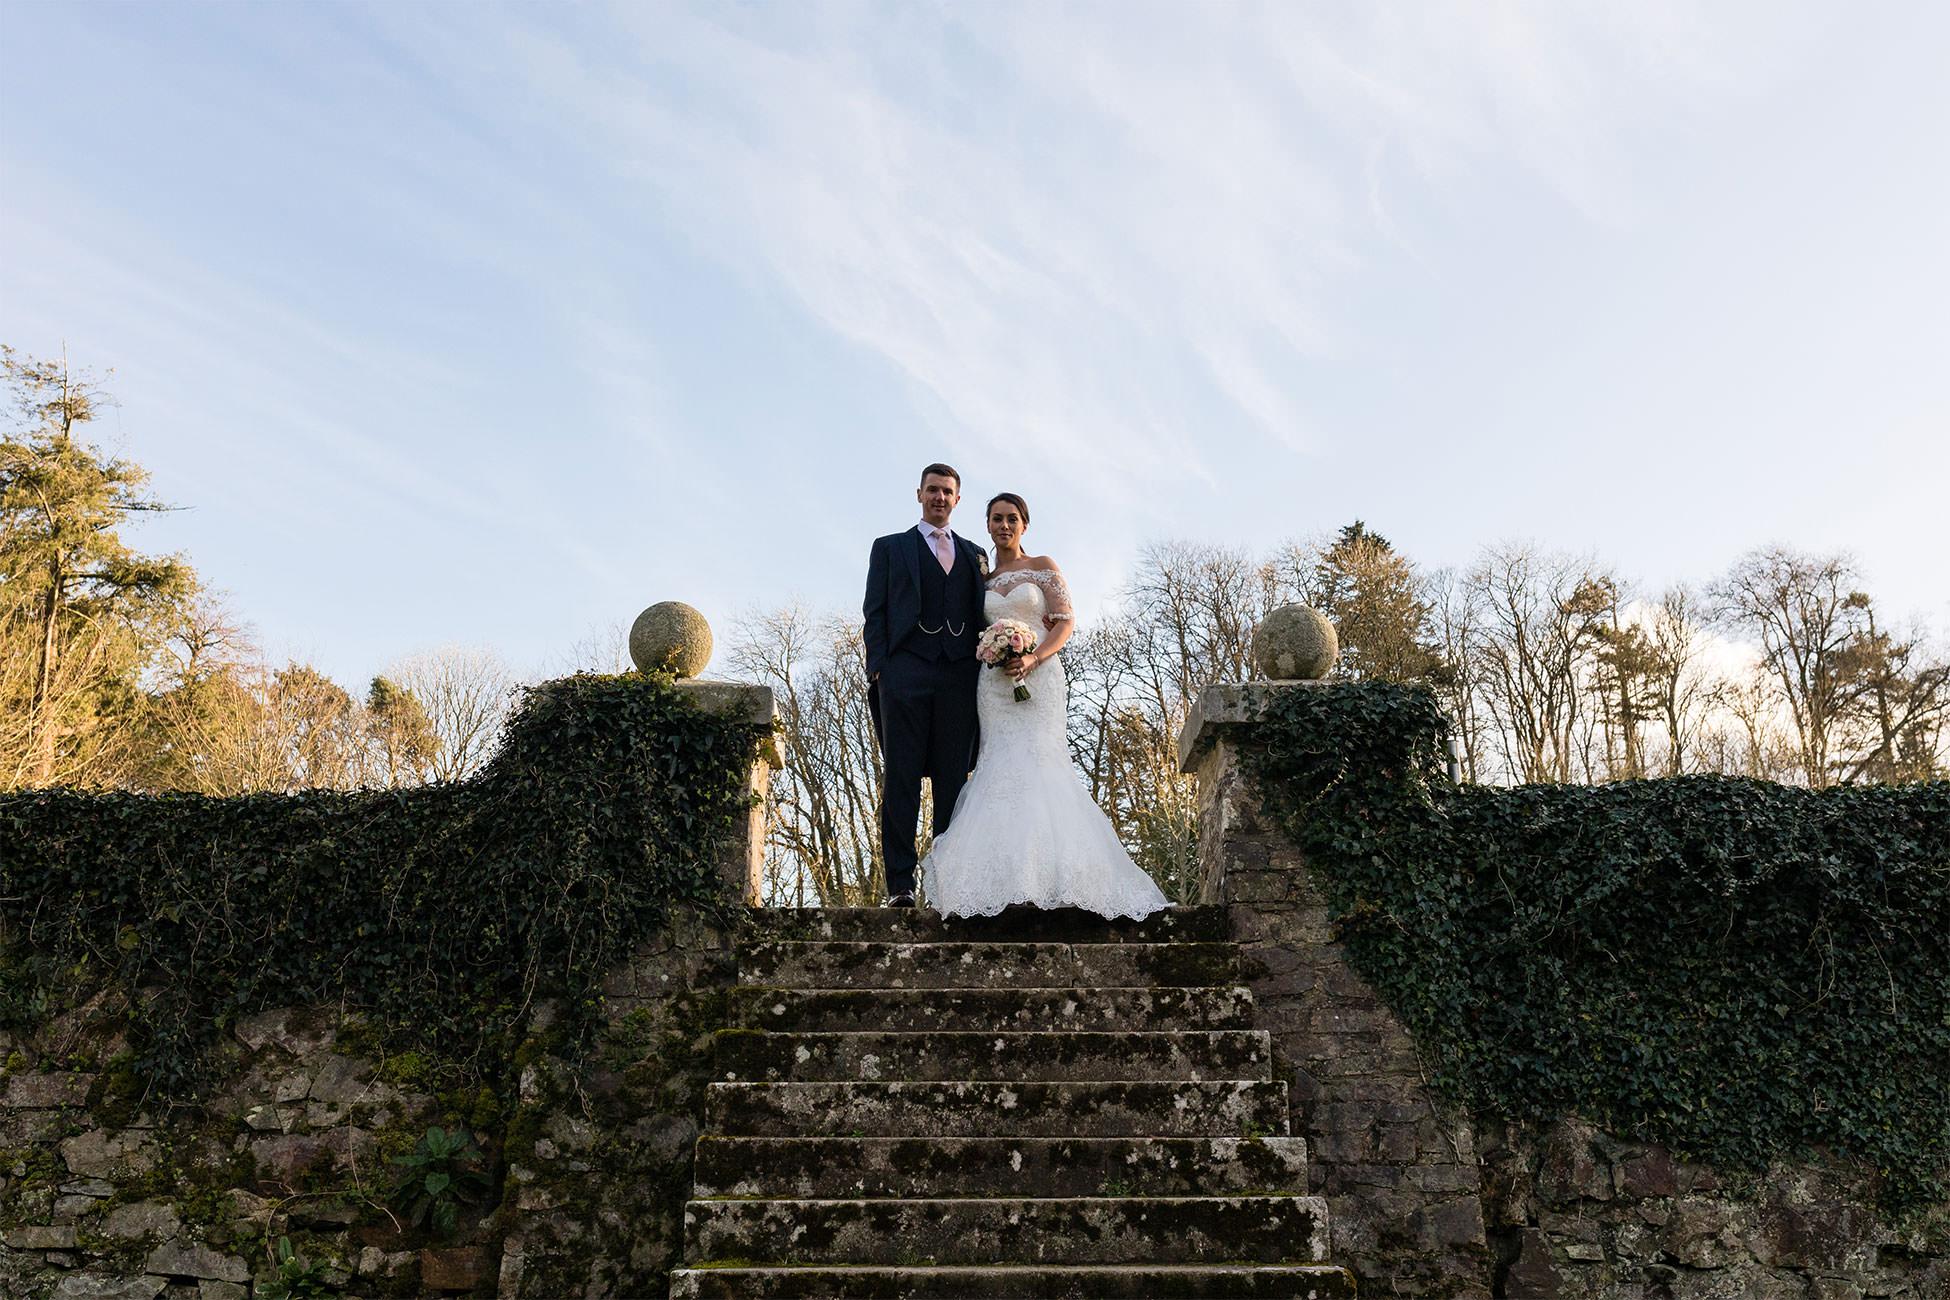 Best Waterford Wedding Photographer 2020